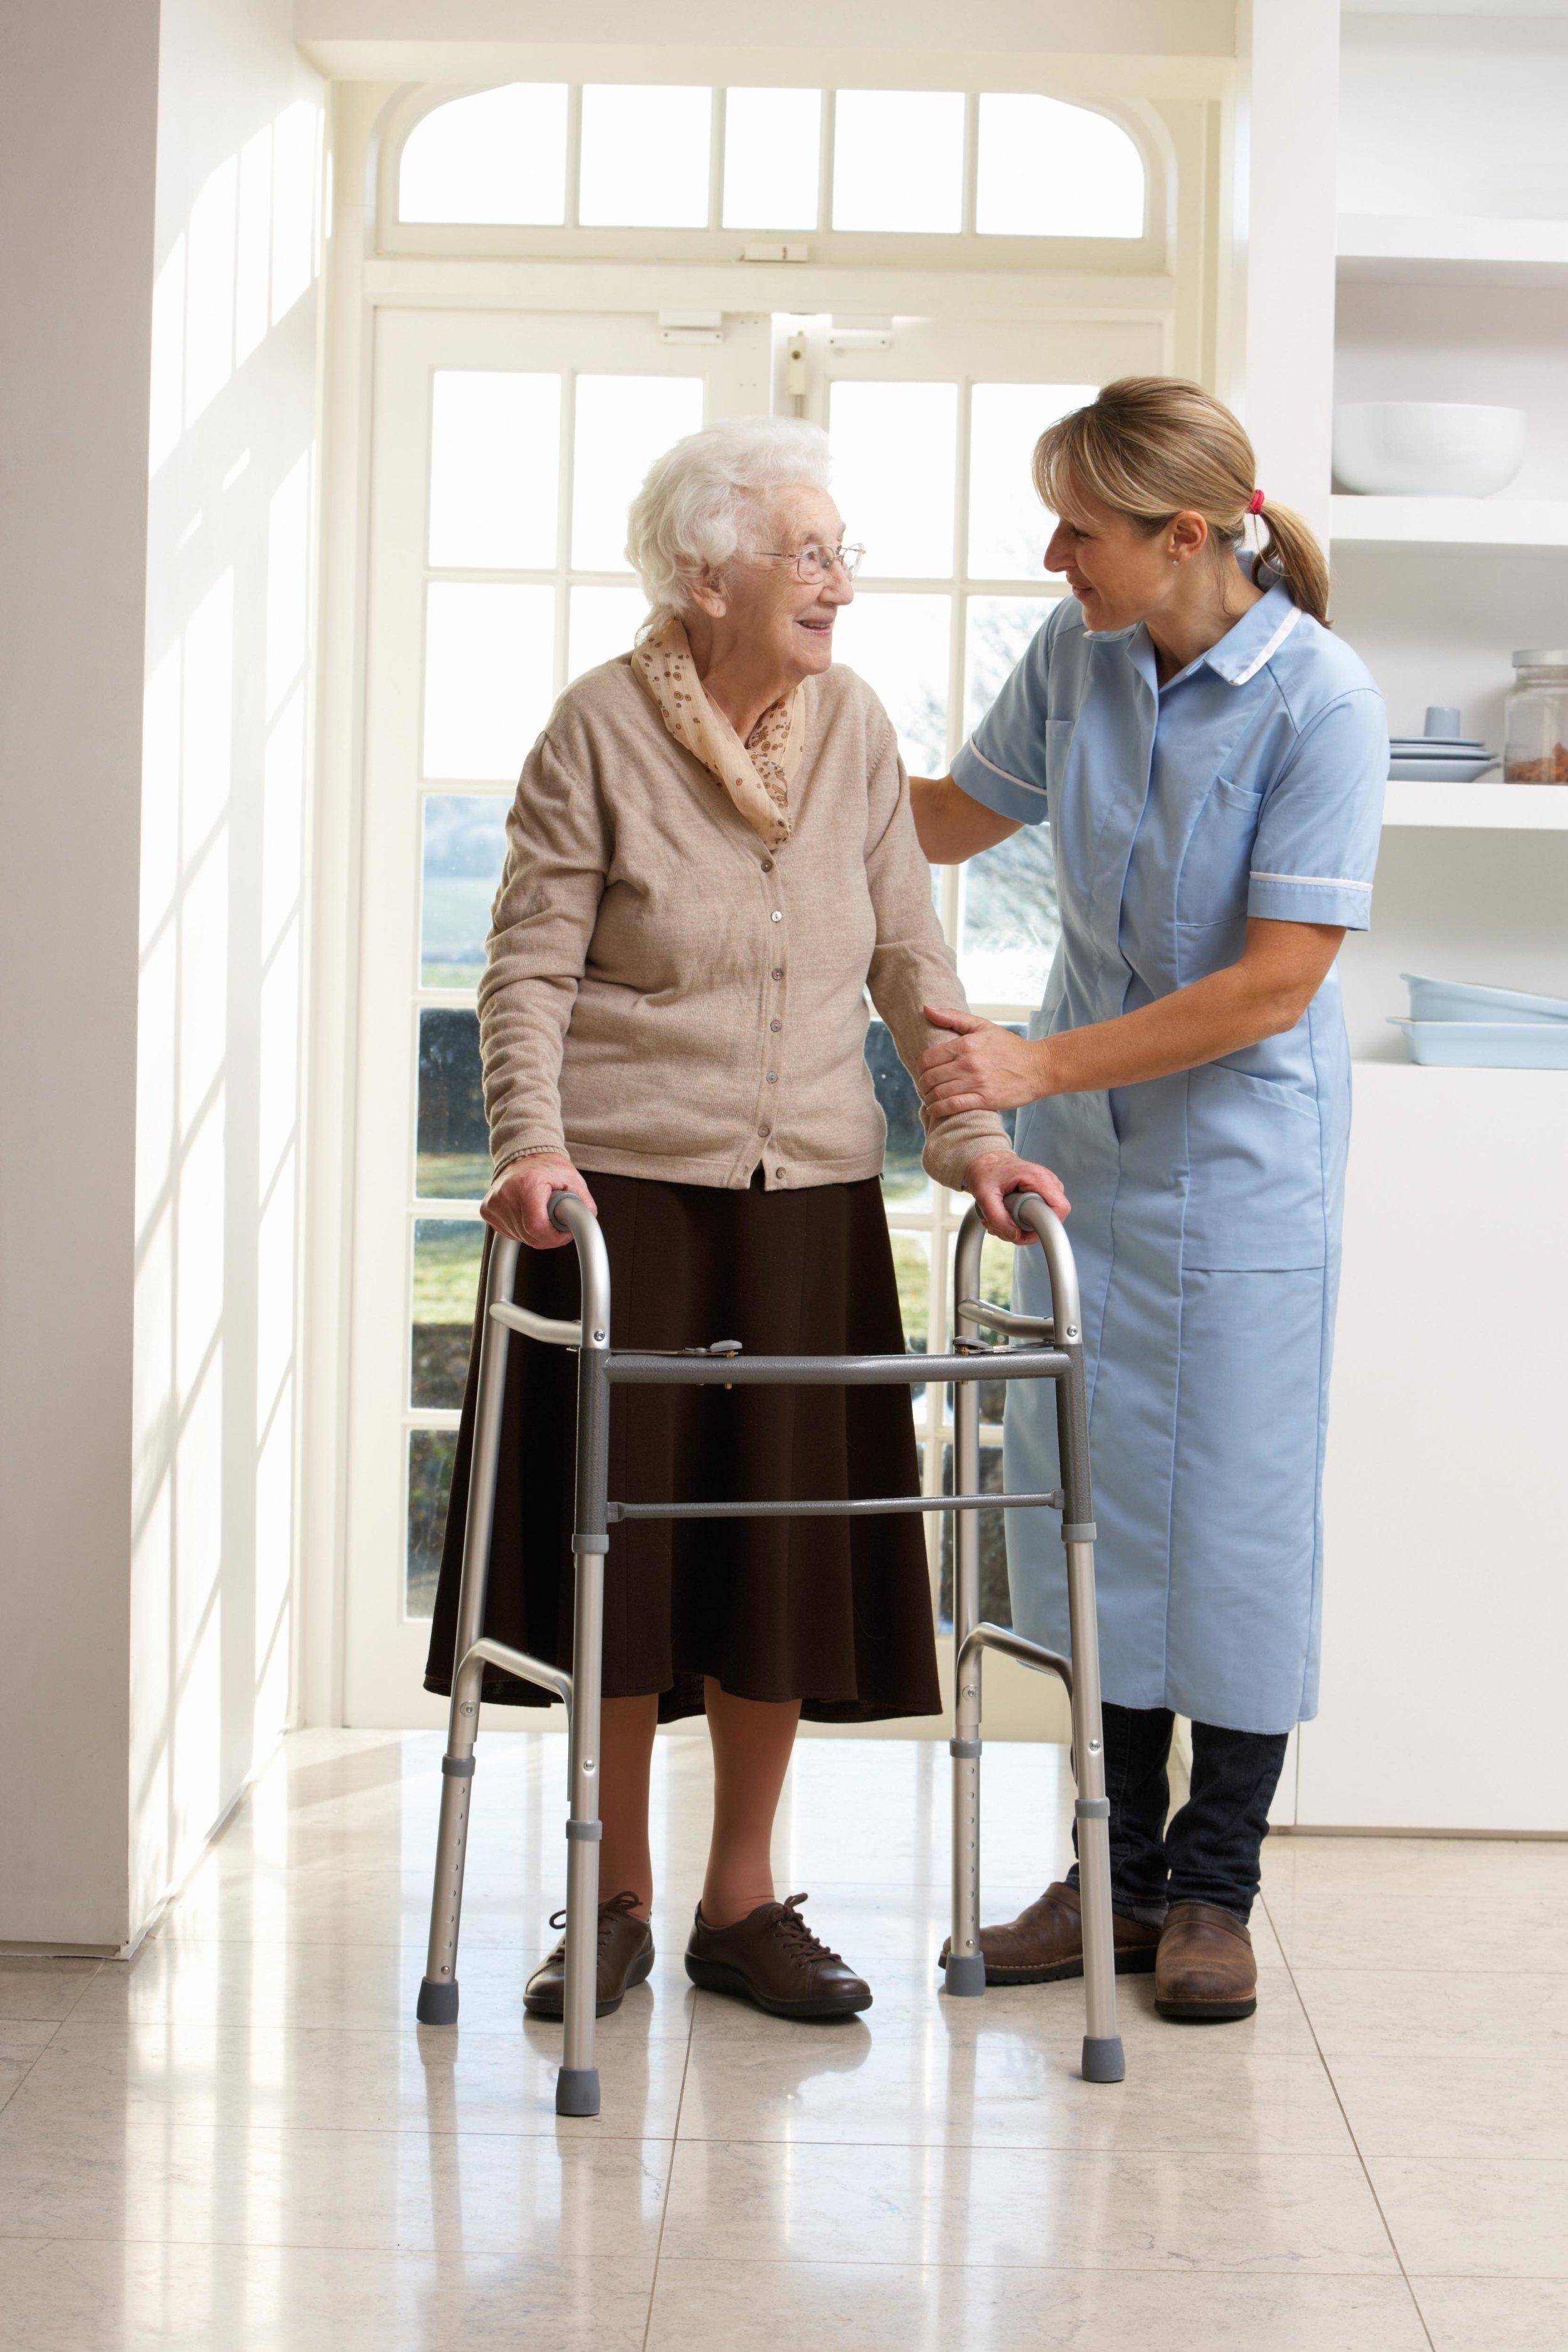 carer-with-elderly-lady-walking-aids.jpg